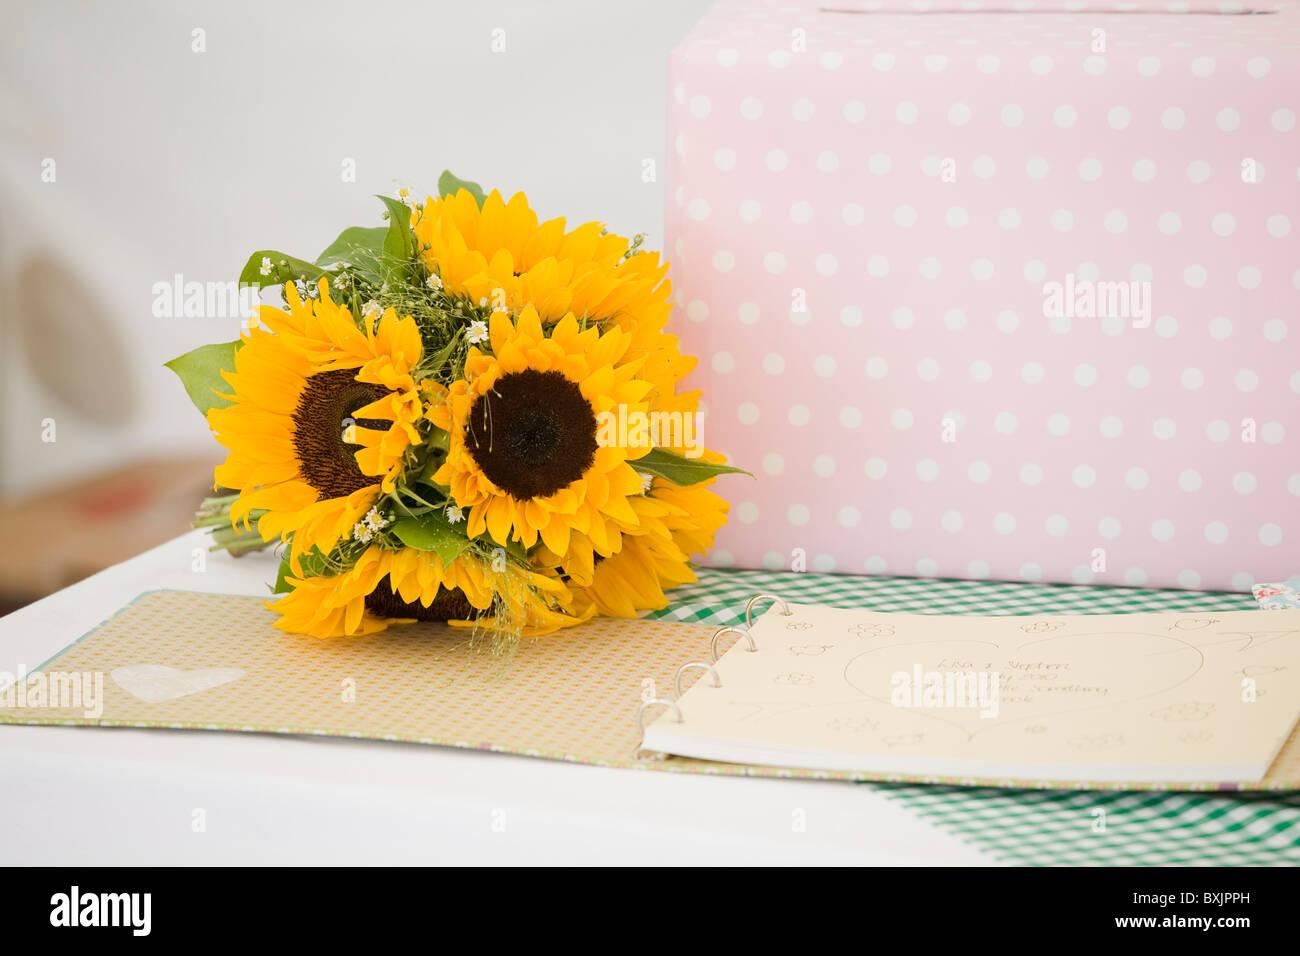 Matrimonio Fiori Girasole : Fiori per un matrimonio in autunno wedding wonderland